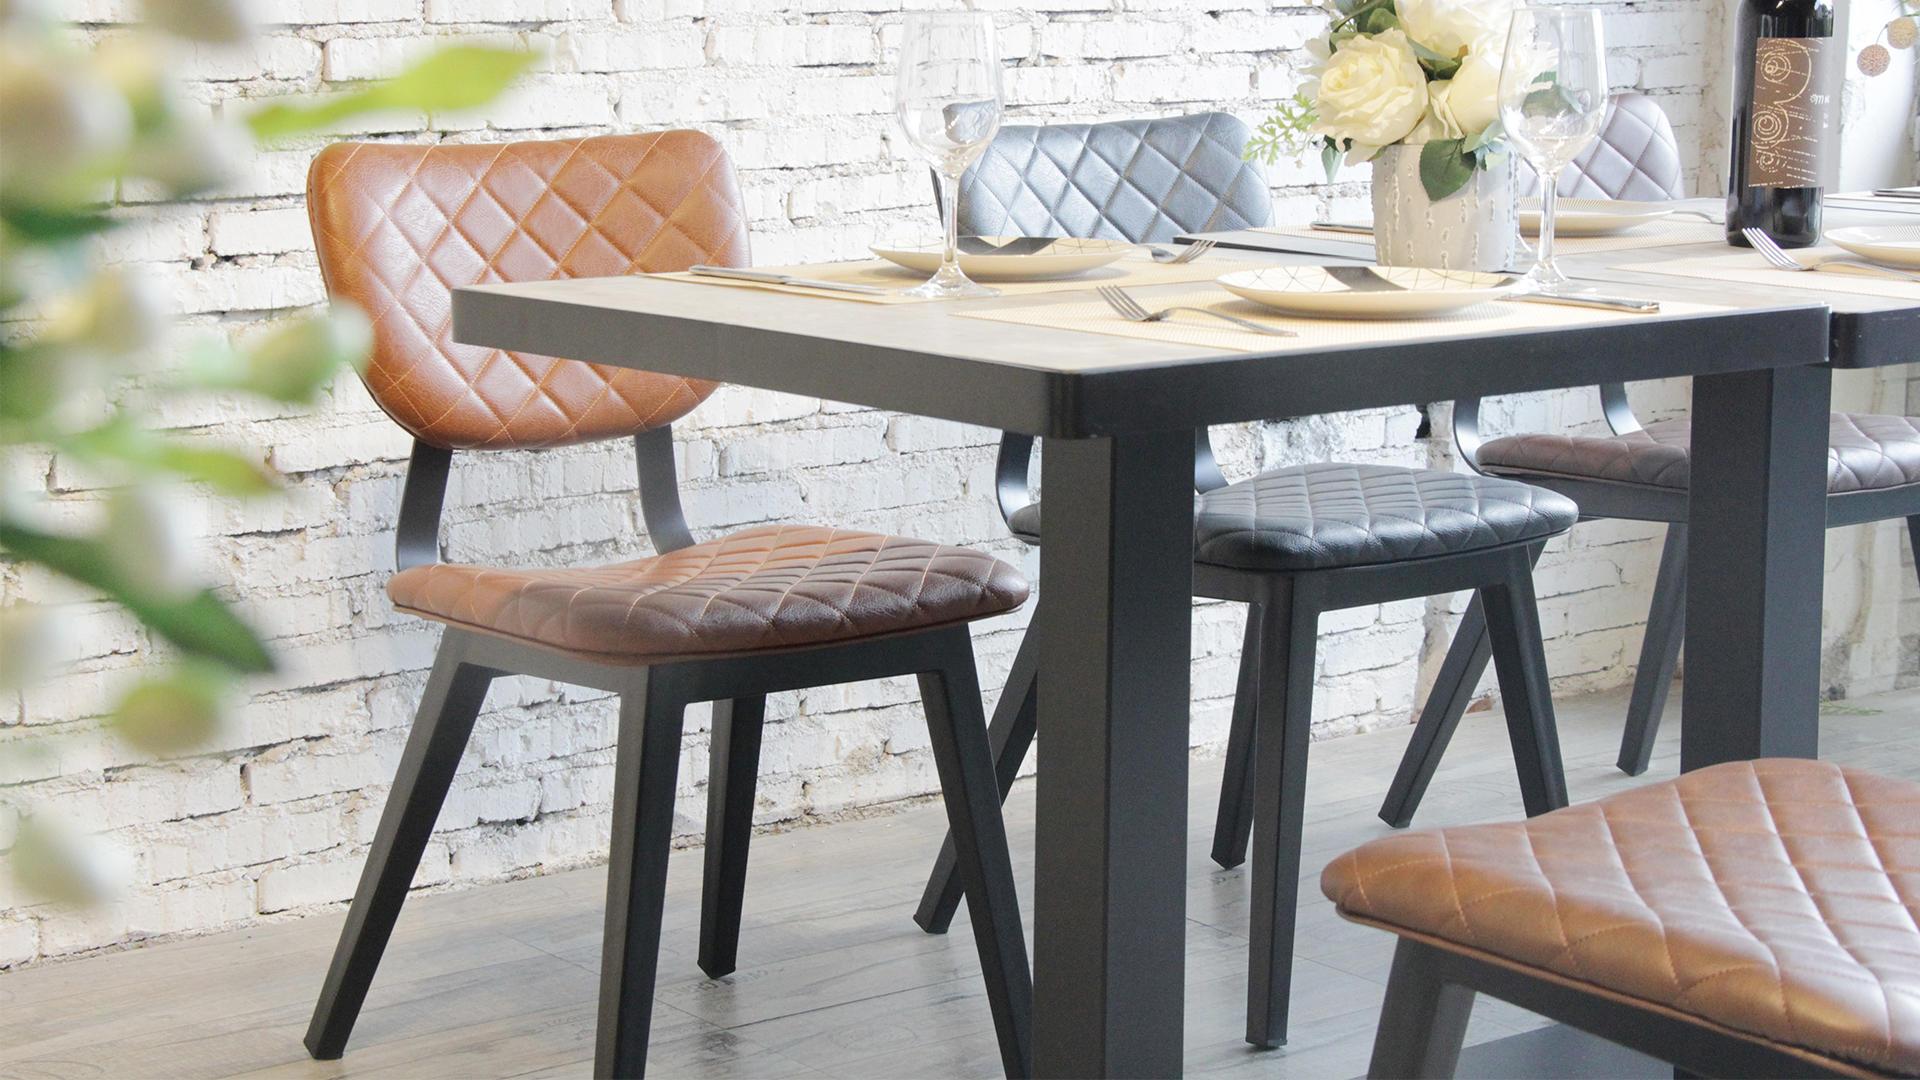 Vintage Industrial Coffee Shop Restaurant Modern Luxury Pu Leather Chair 724-H45-STPU